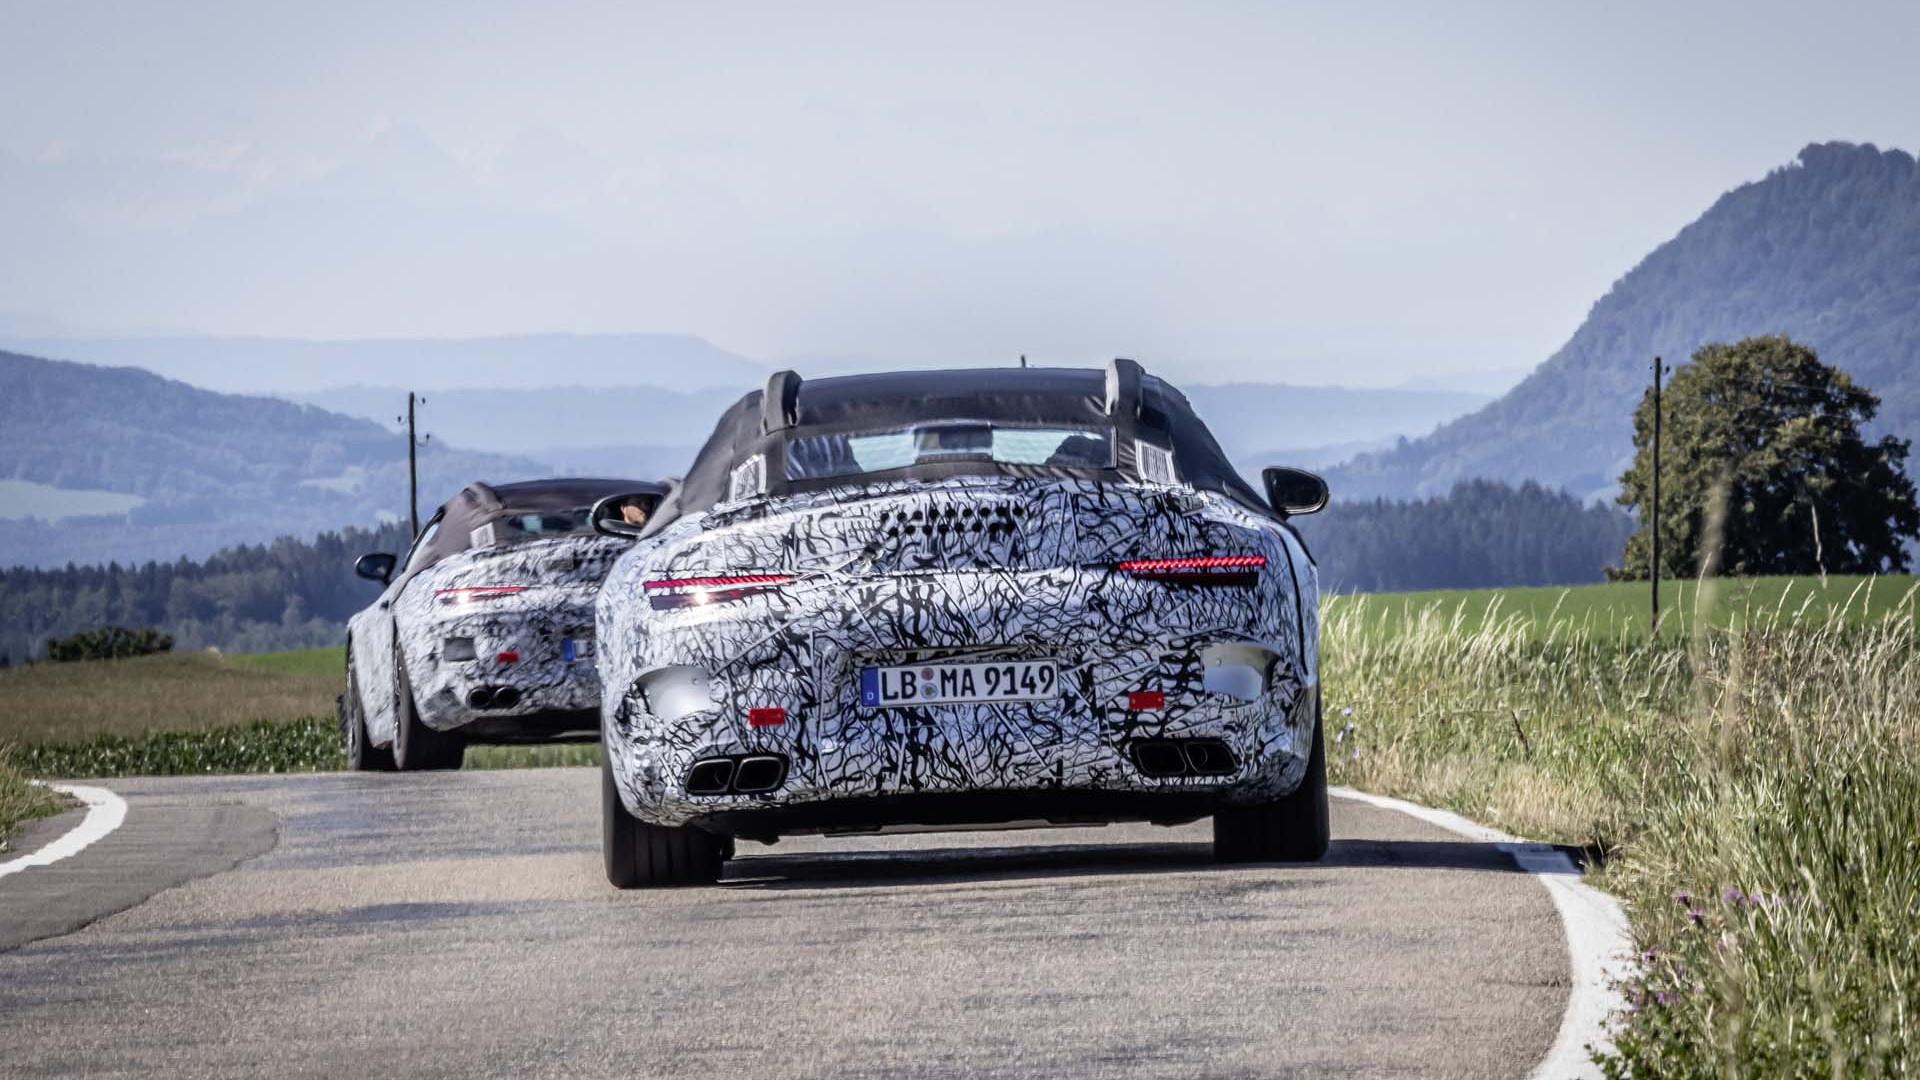 2022 Mercedes-AMG SL Roadster prototype